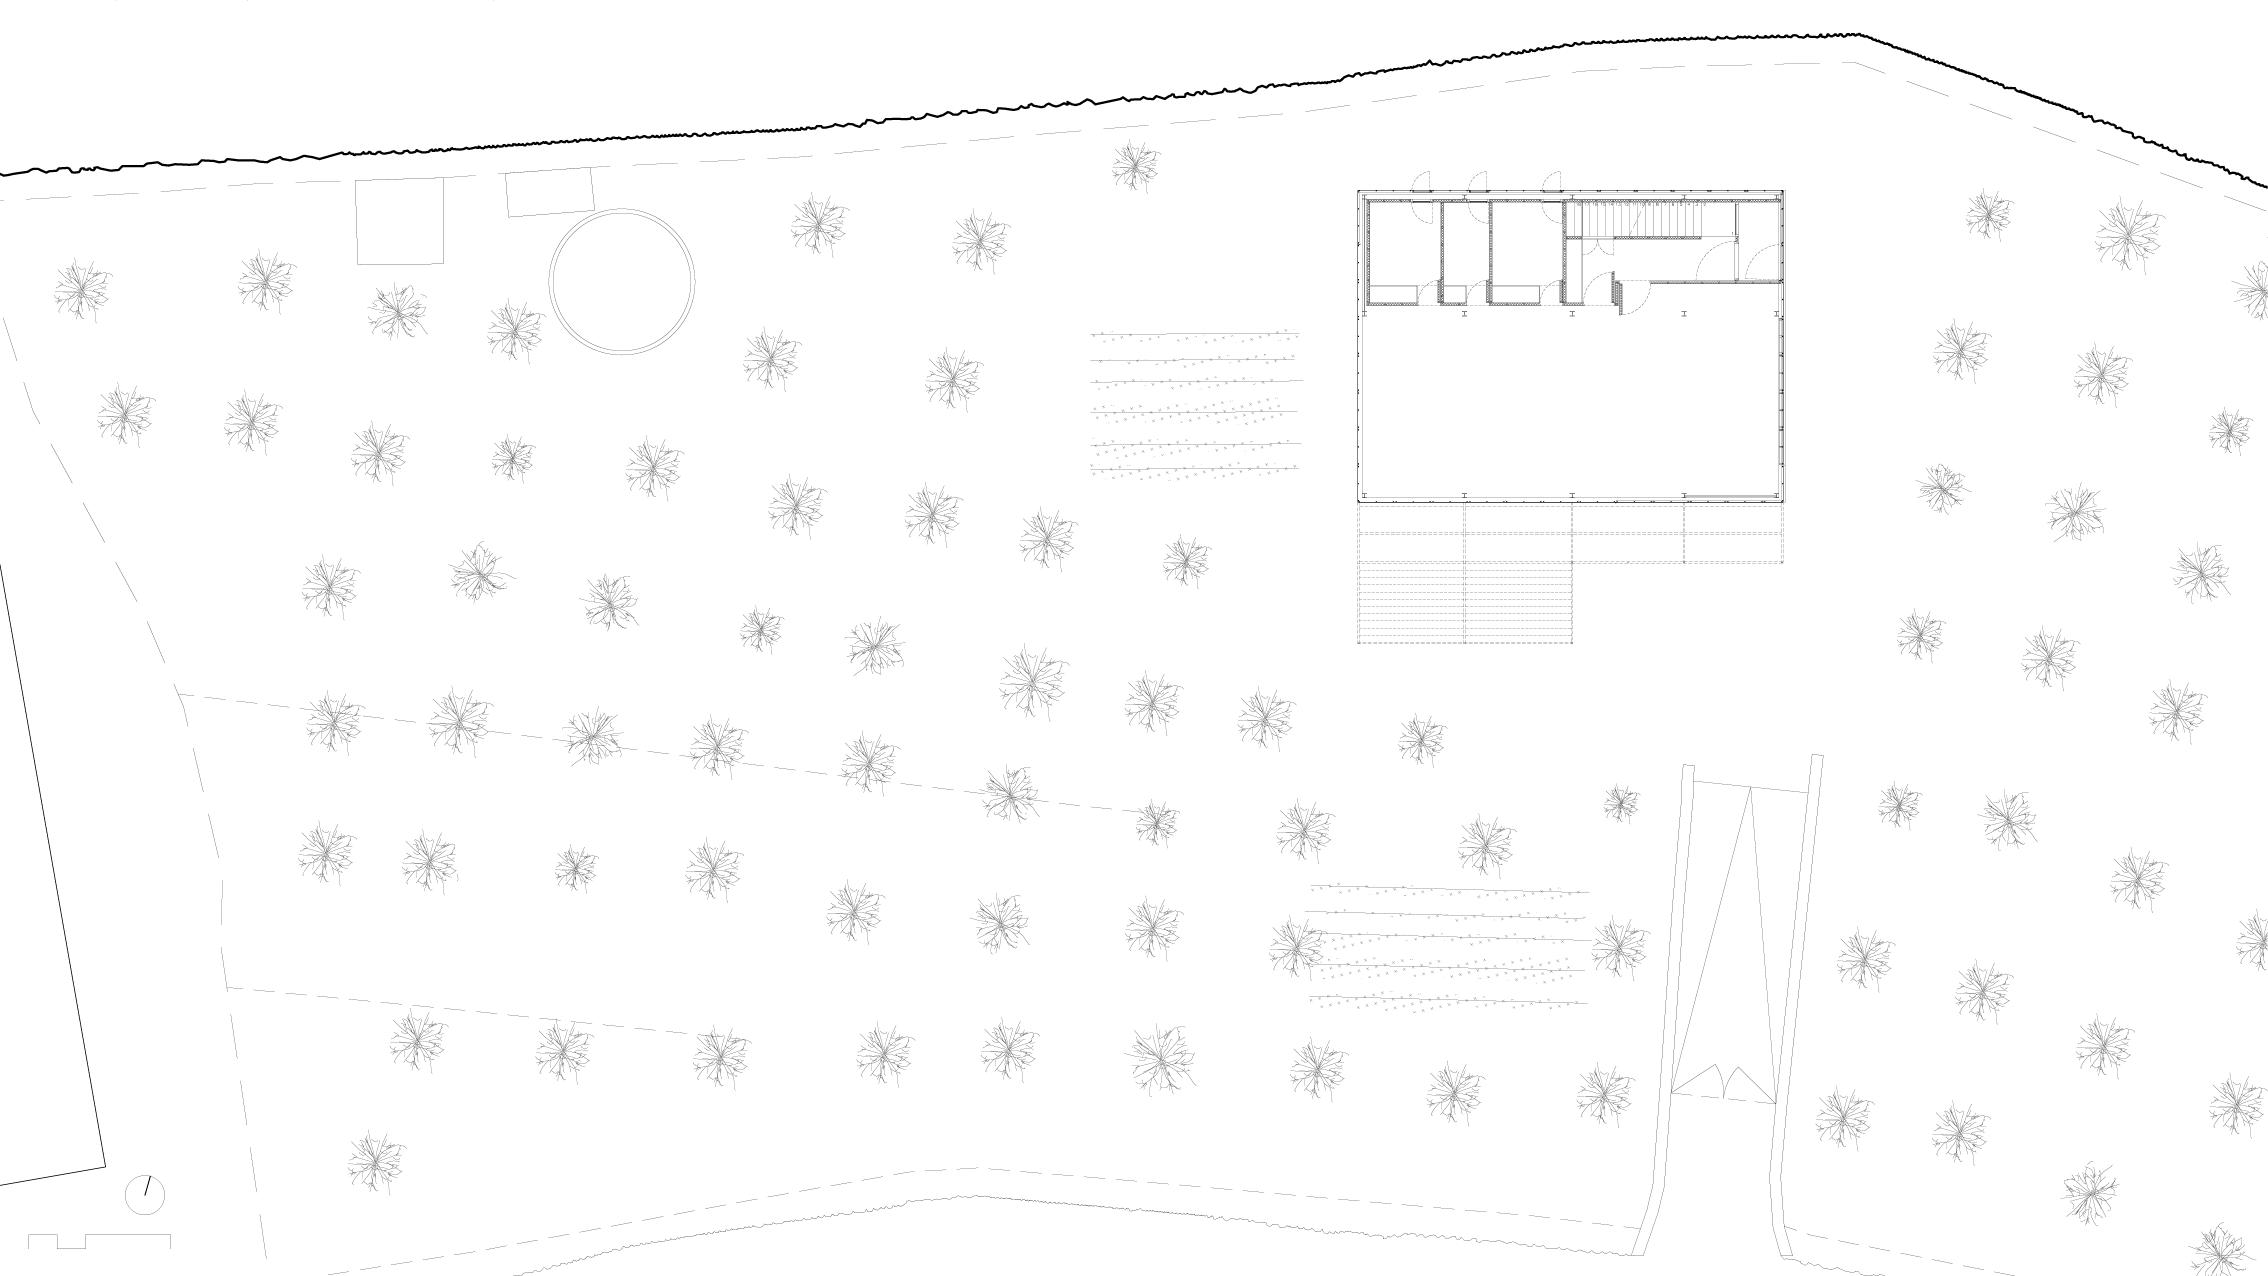 hivern_planta-baixa_100_sense-mobiliari-wb.png